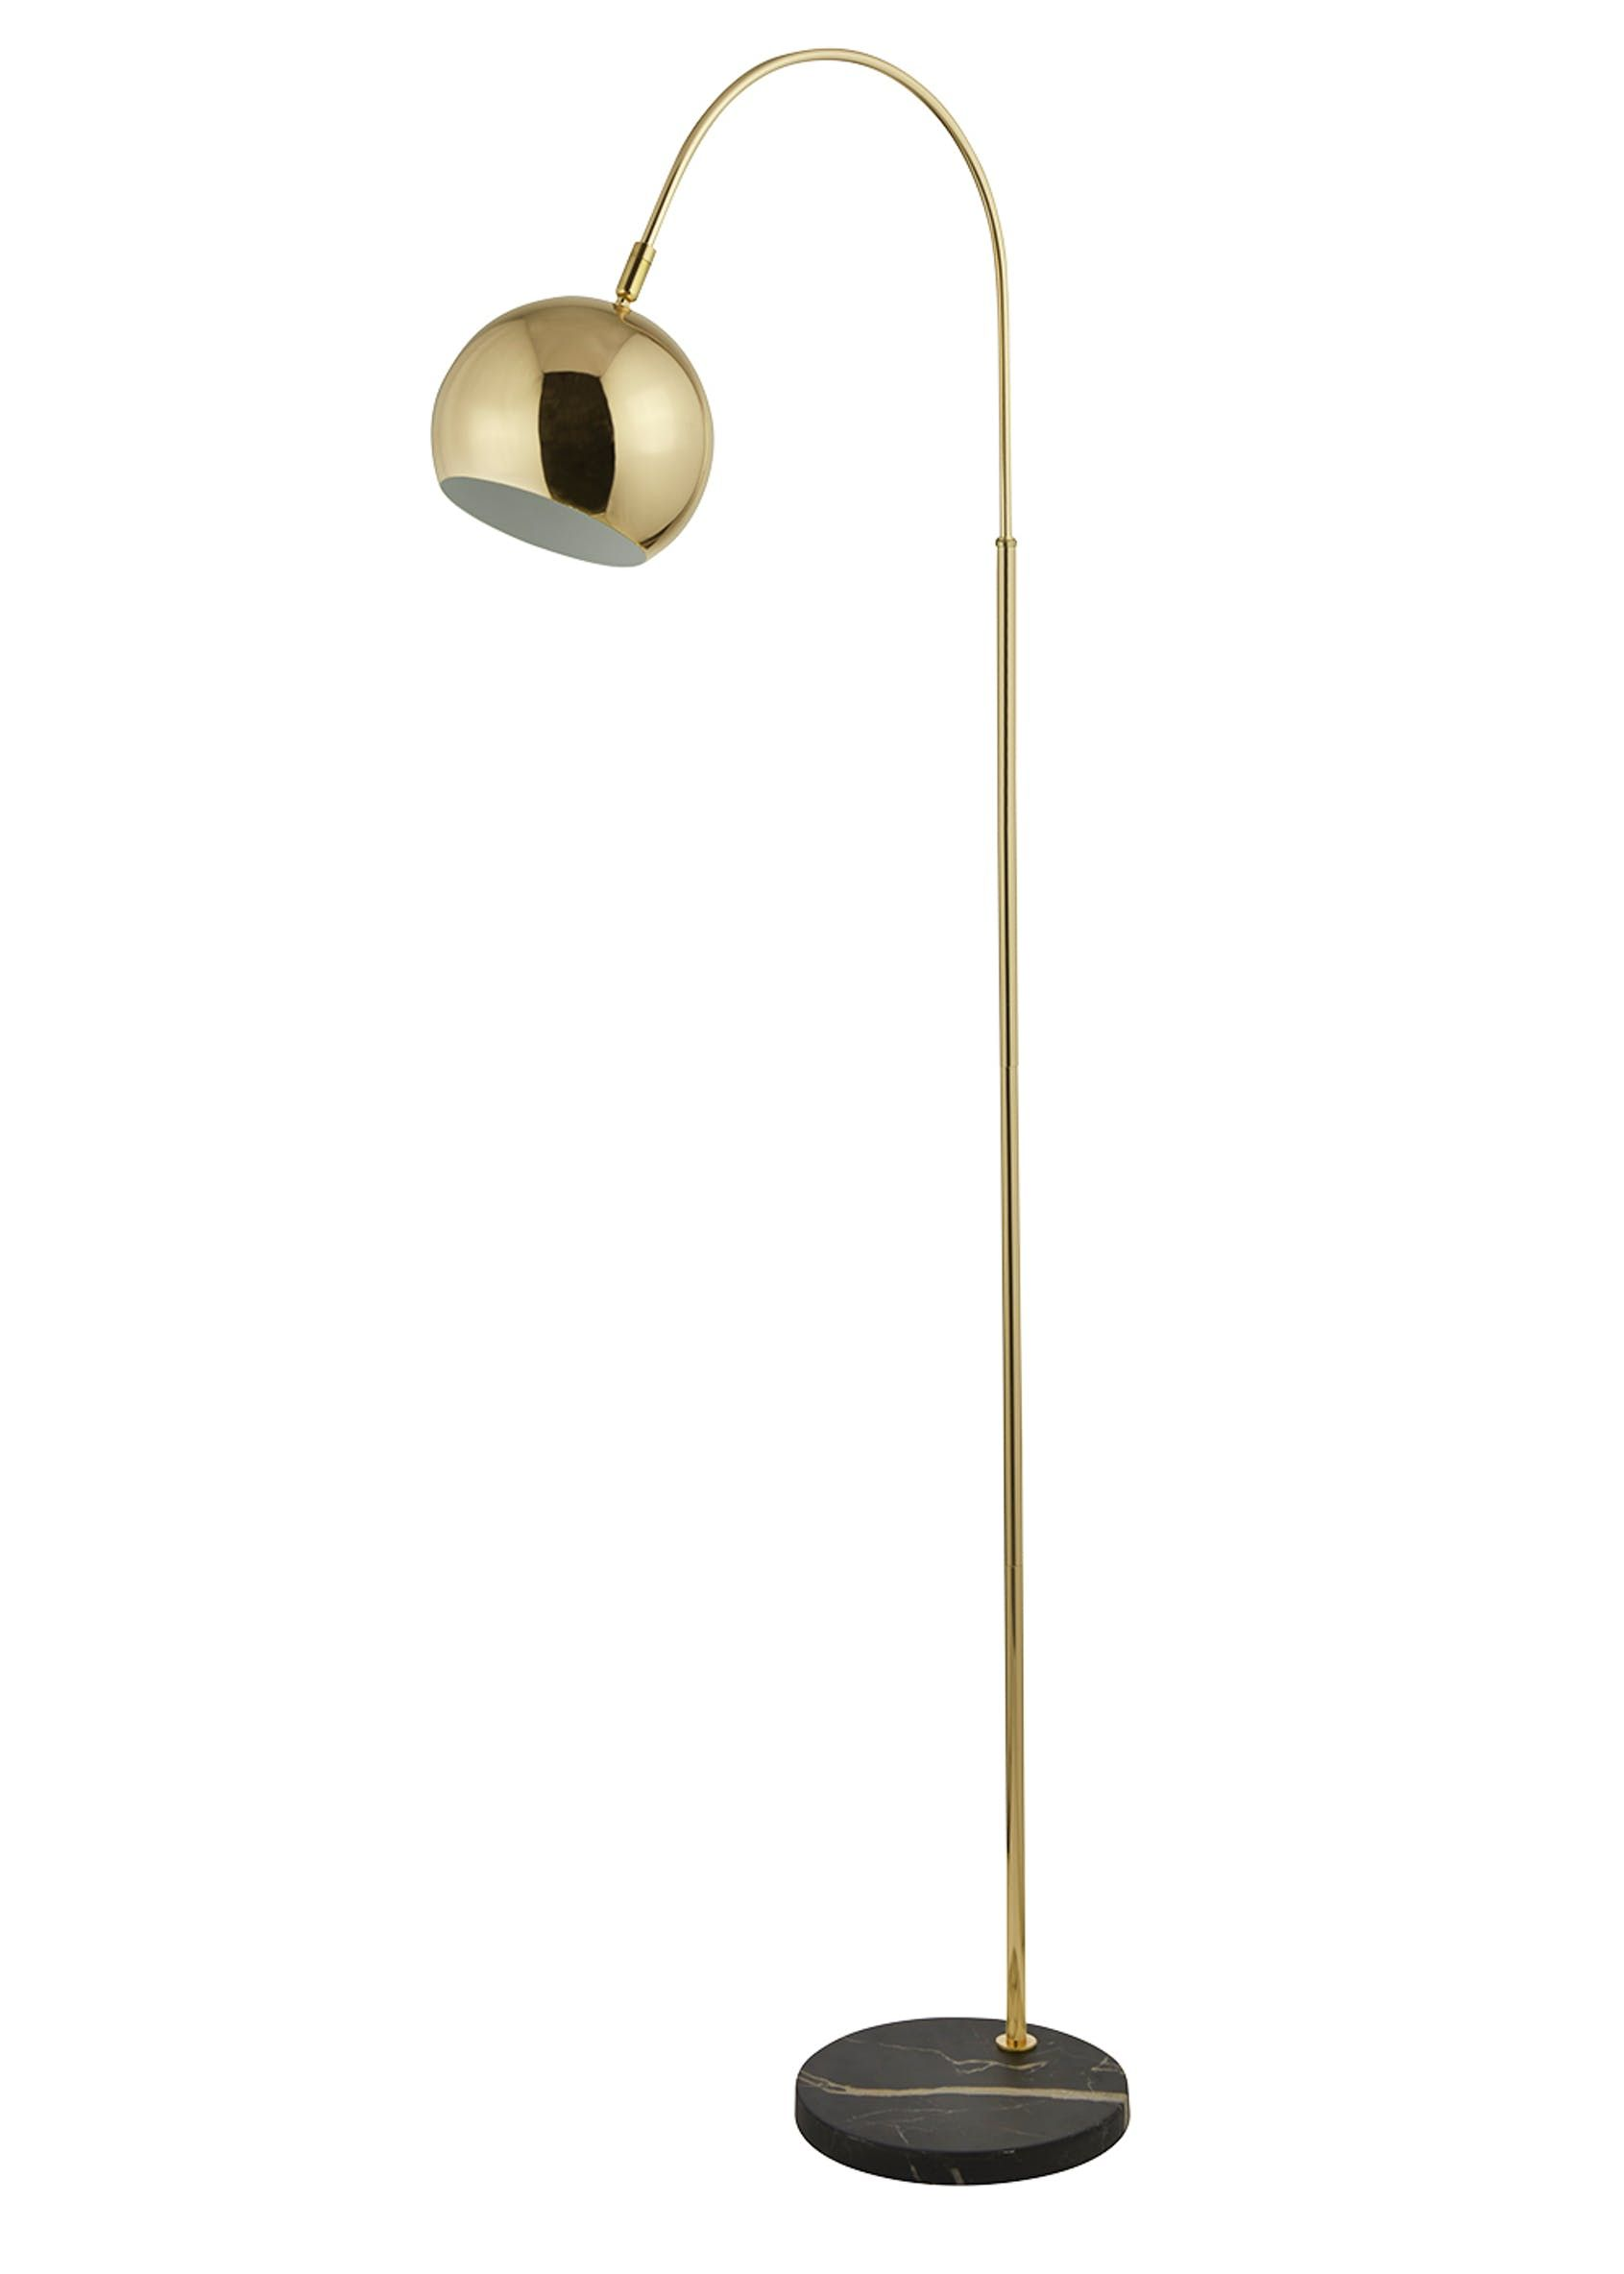 Tulip Smoked Glass Floor Lamp H105cm X W46cm Grey Glass